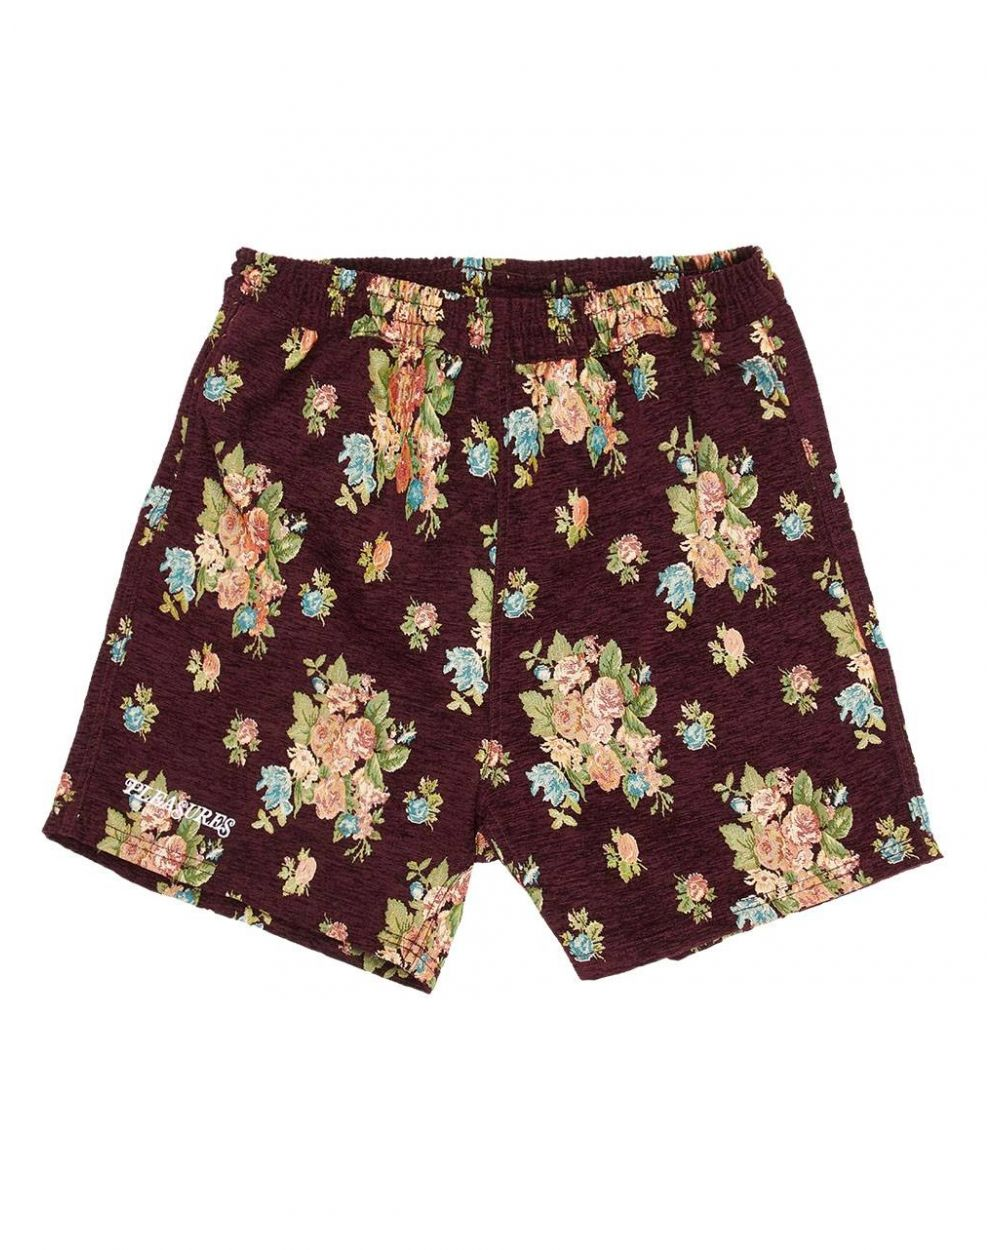 Pleasures Dejavu woven floral shorts - maroon Pleasures Shorts 81,15€